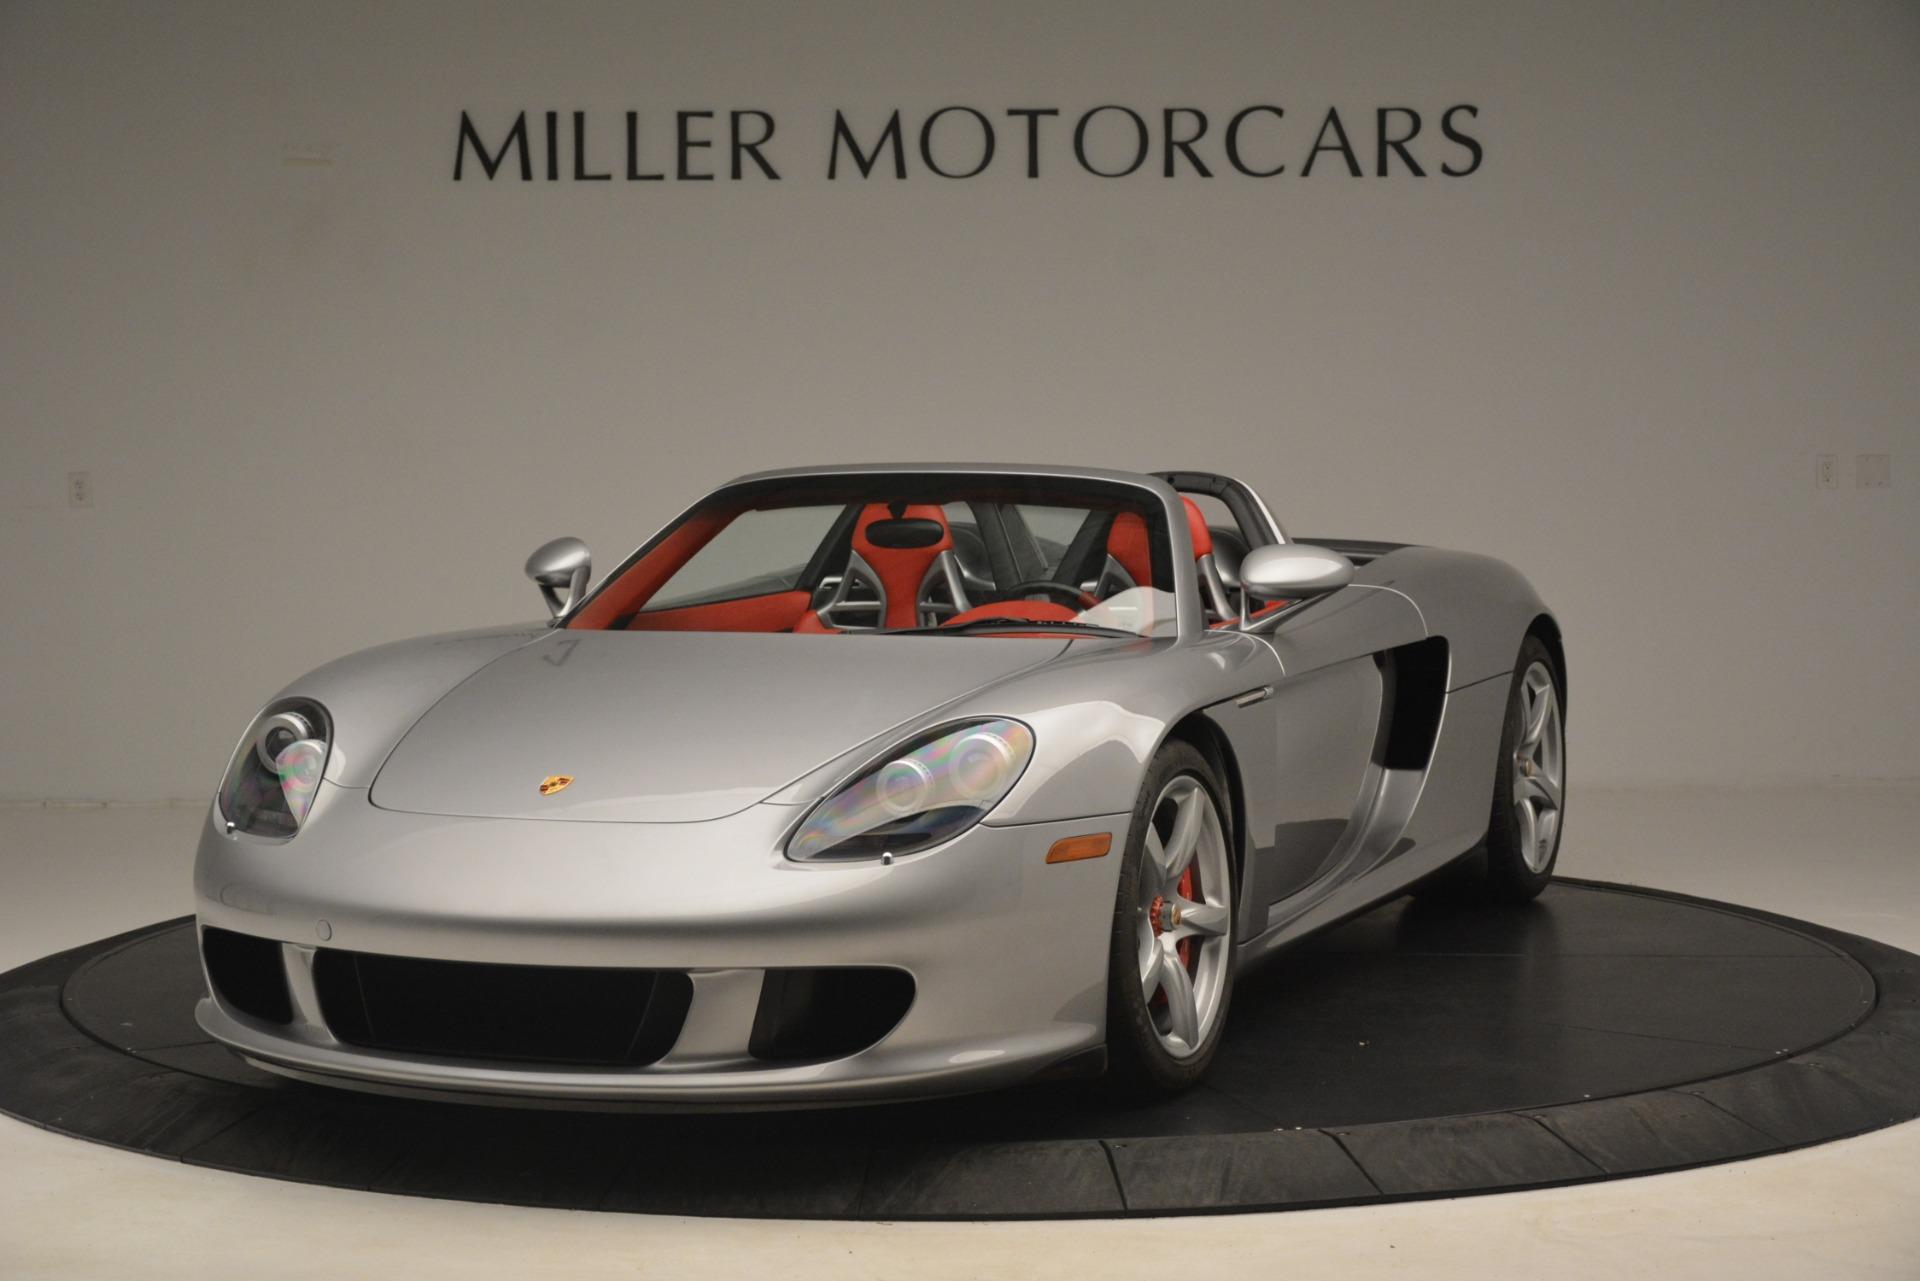 Used 2005 Porsche Carrera GT for sale Sold at Alfa Romeo of Greenwich in Greenwich CT 06830 1